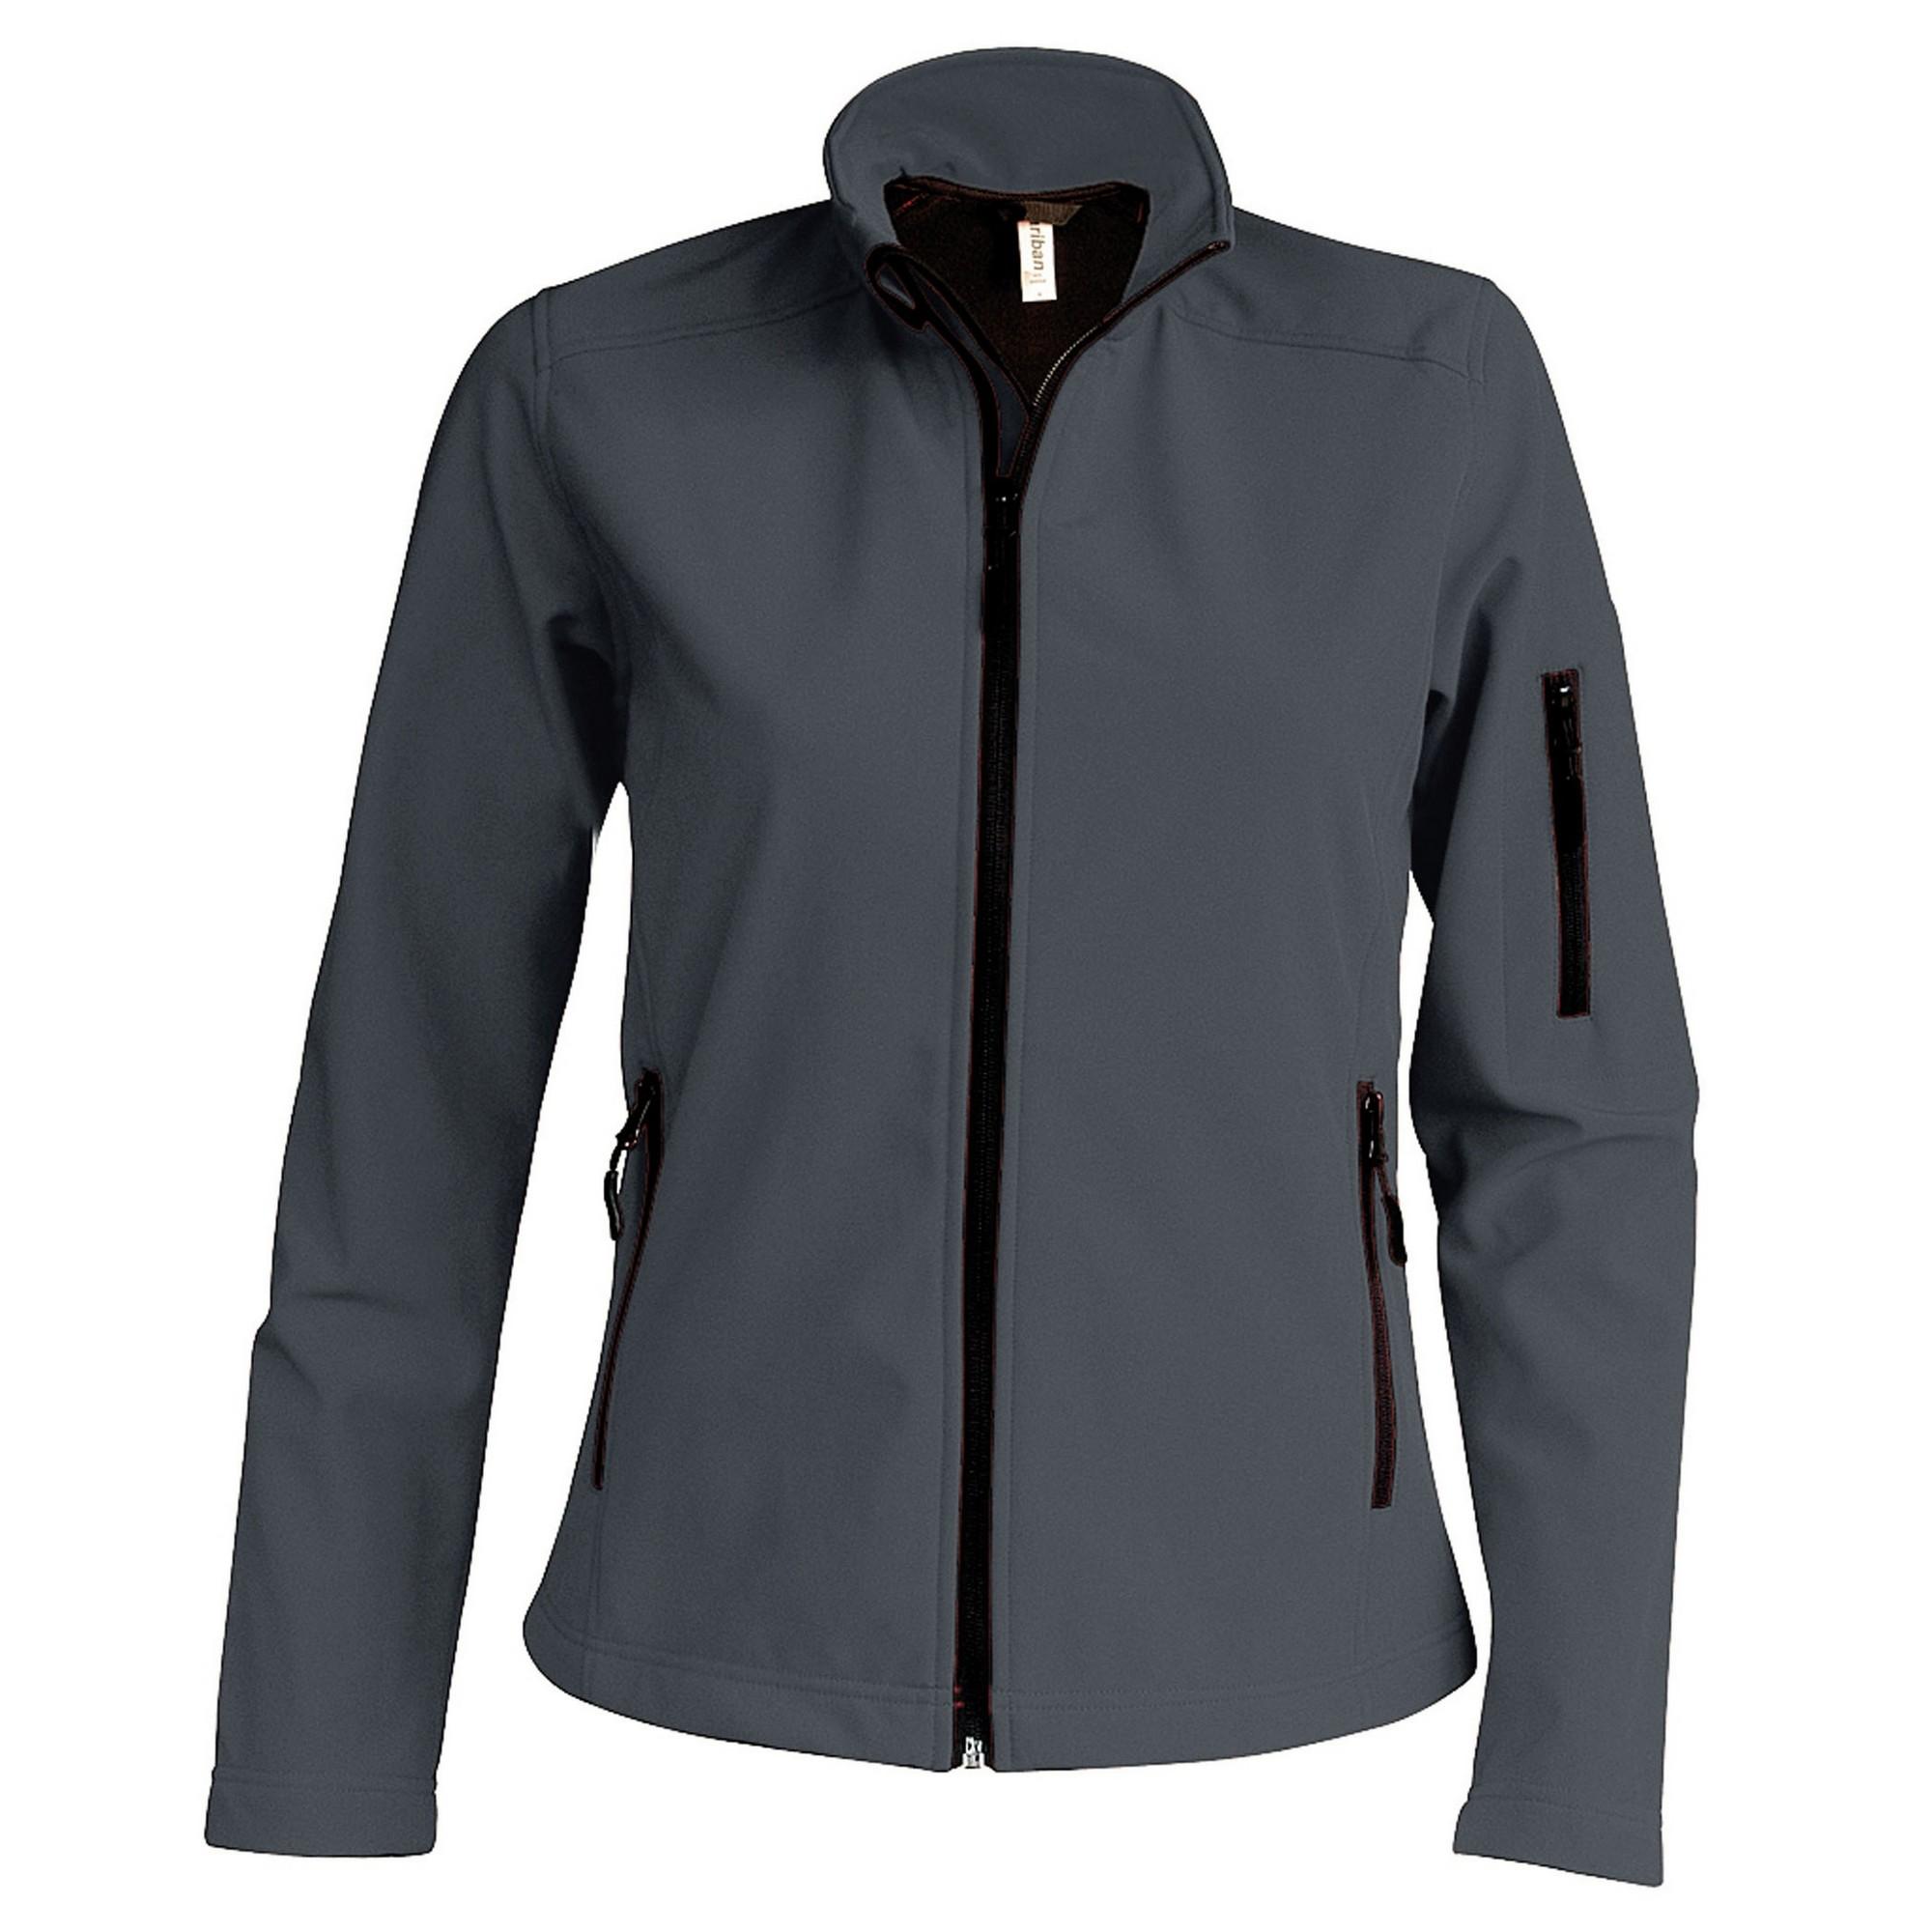 Kariban Womens/Ladies Contemporary Softshell 3 Layer Performance Jacket (L) (Marl Grey)